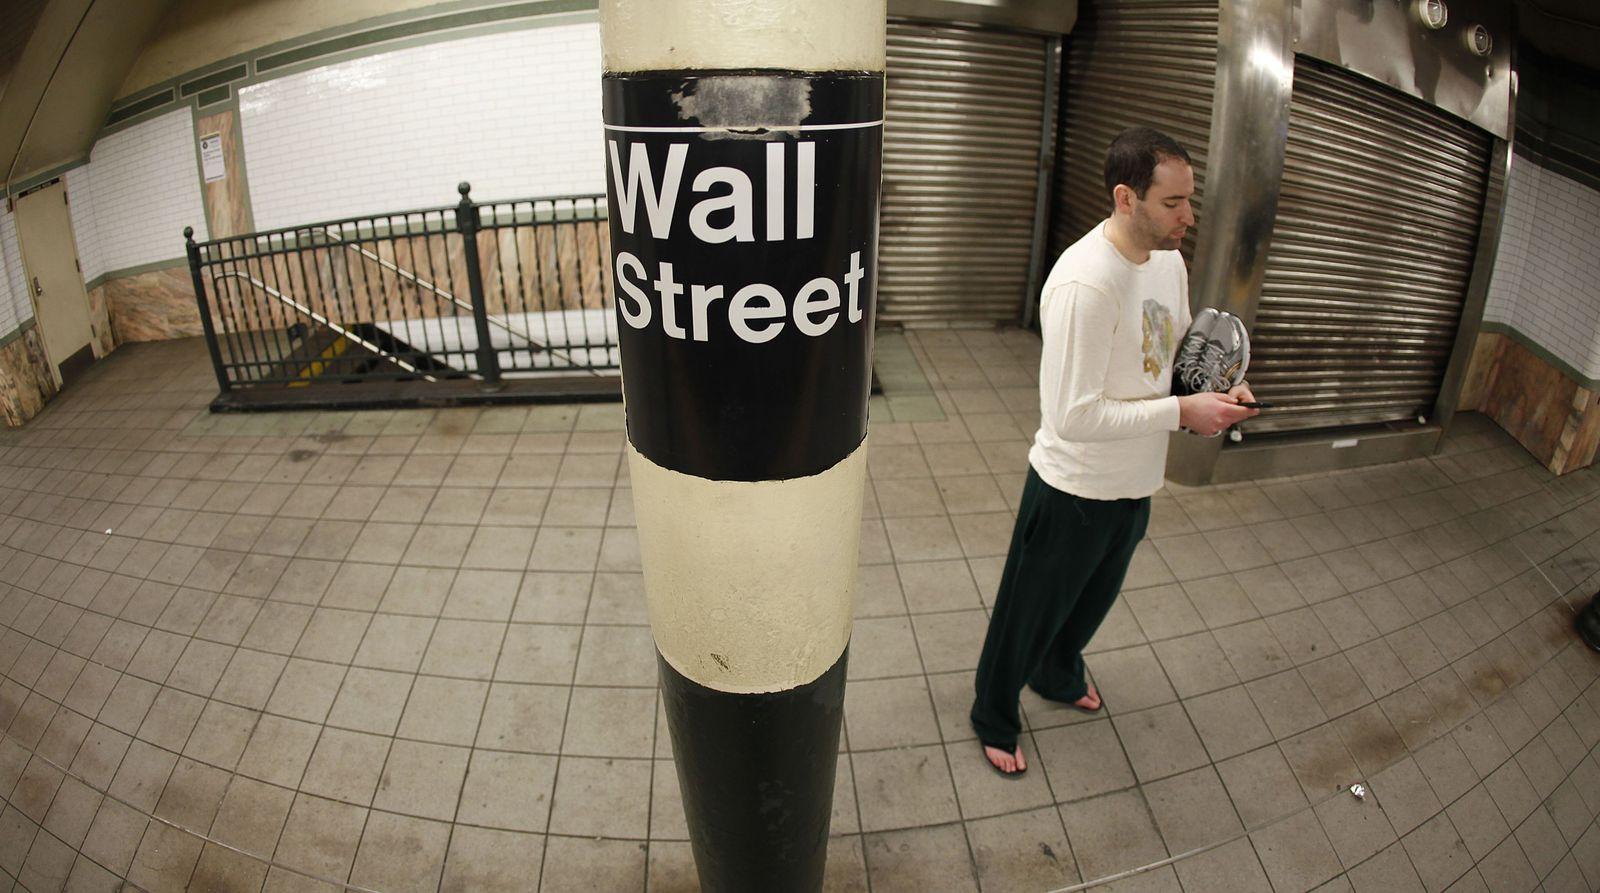 USA Hurrikan Wall Street